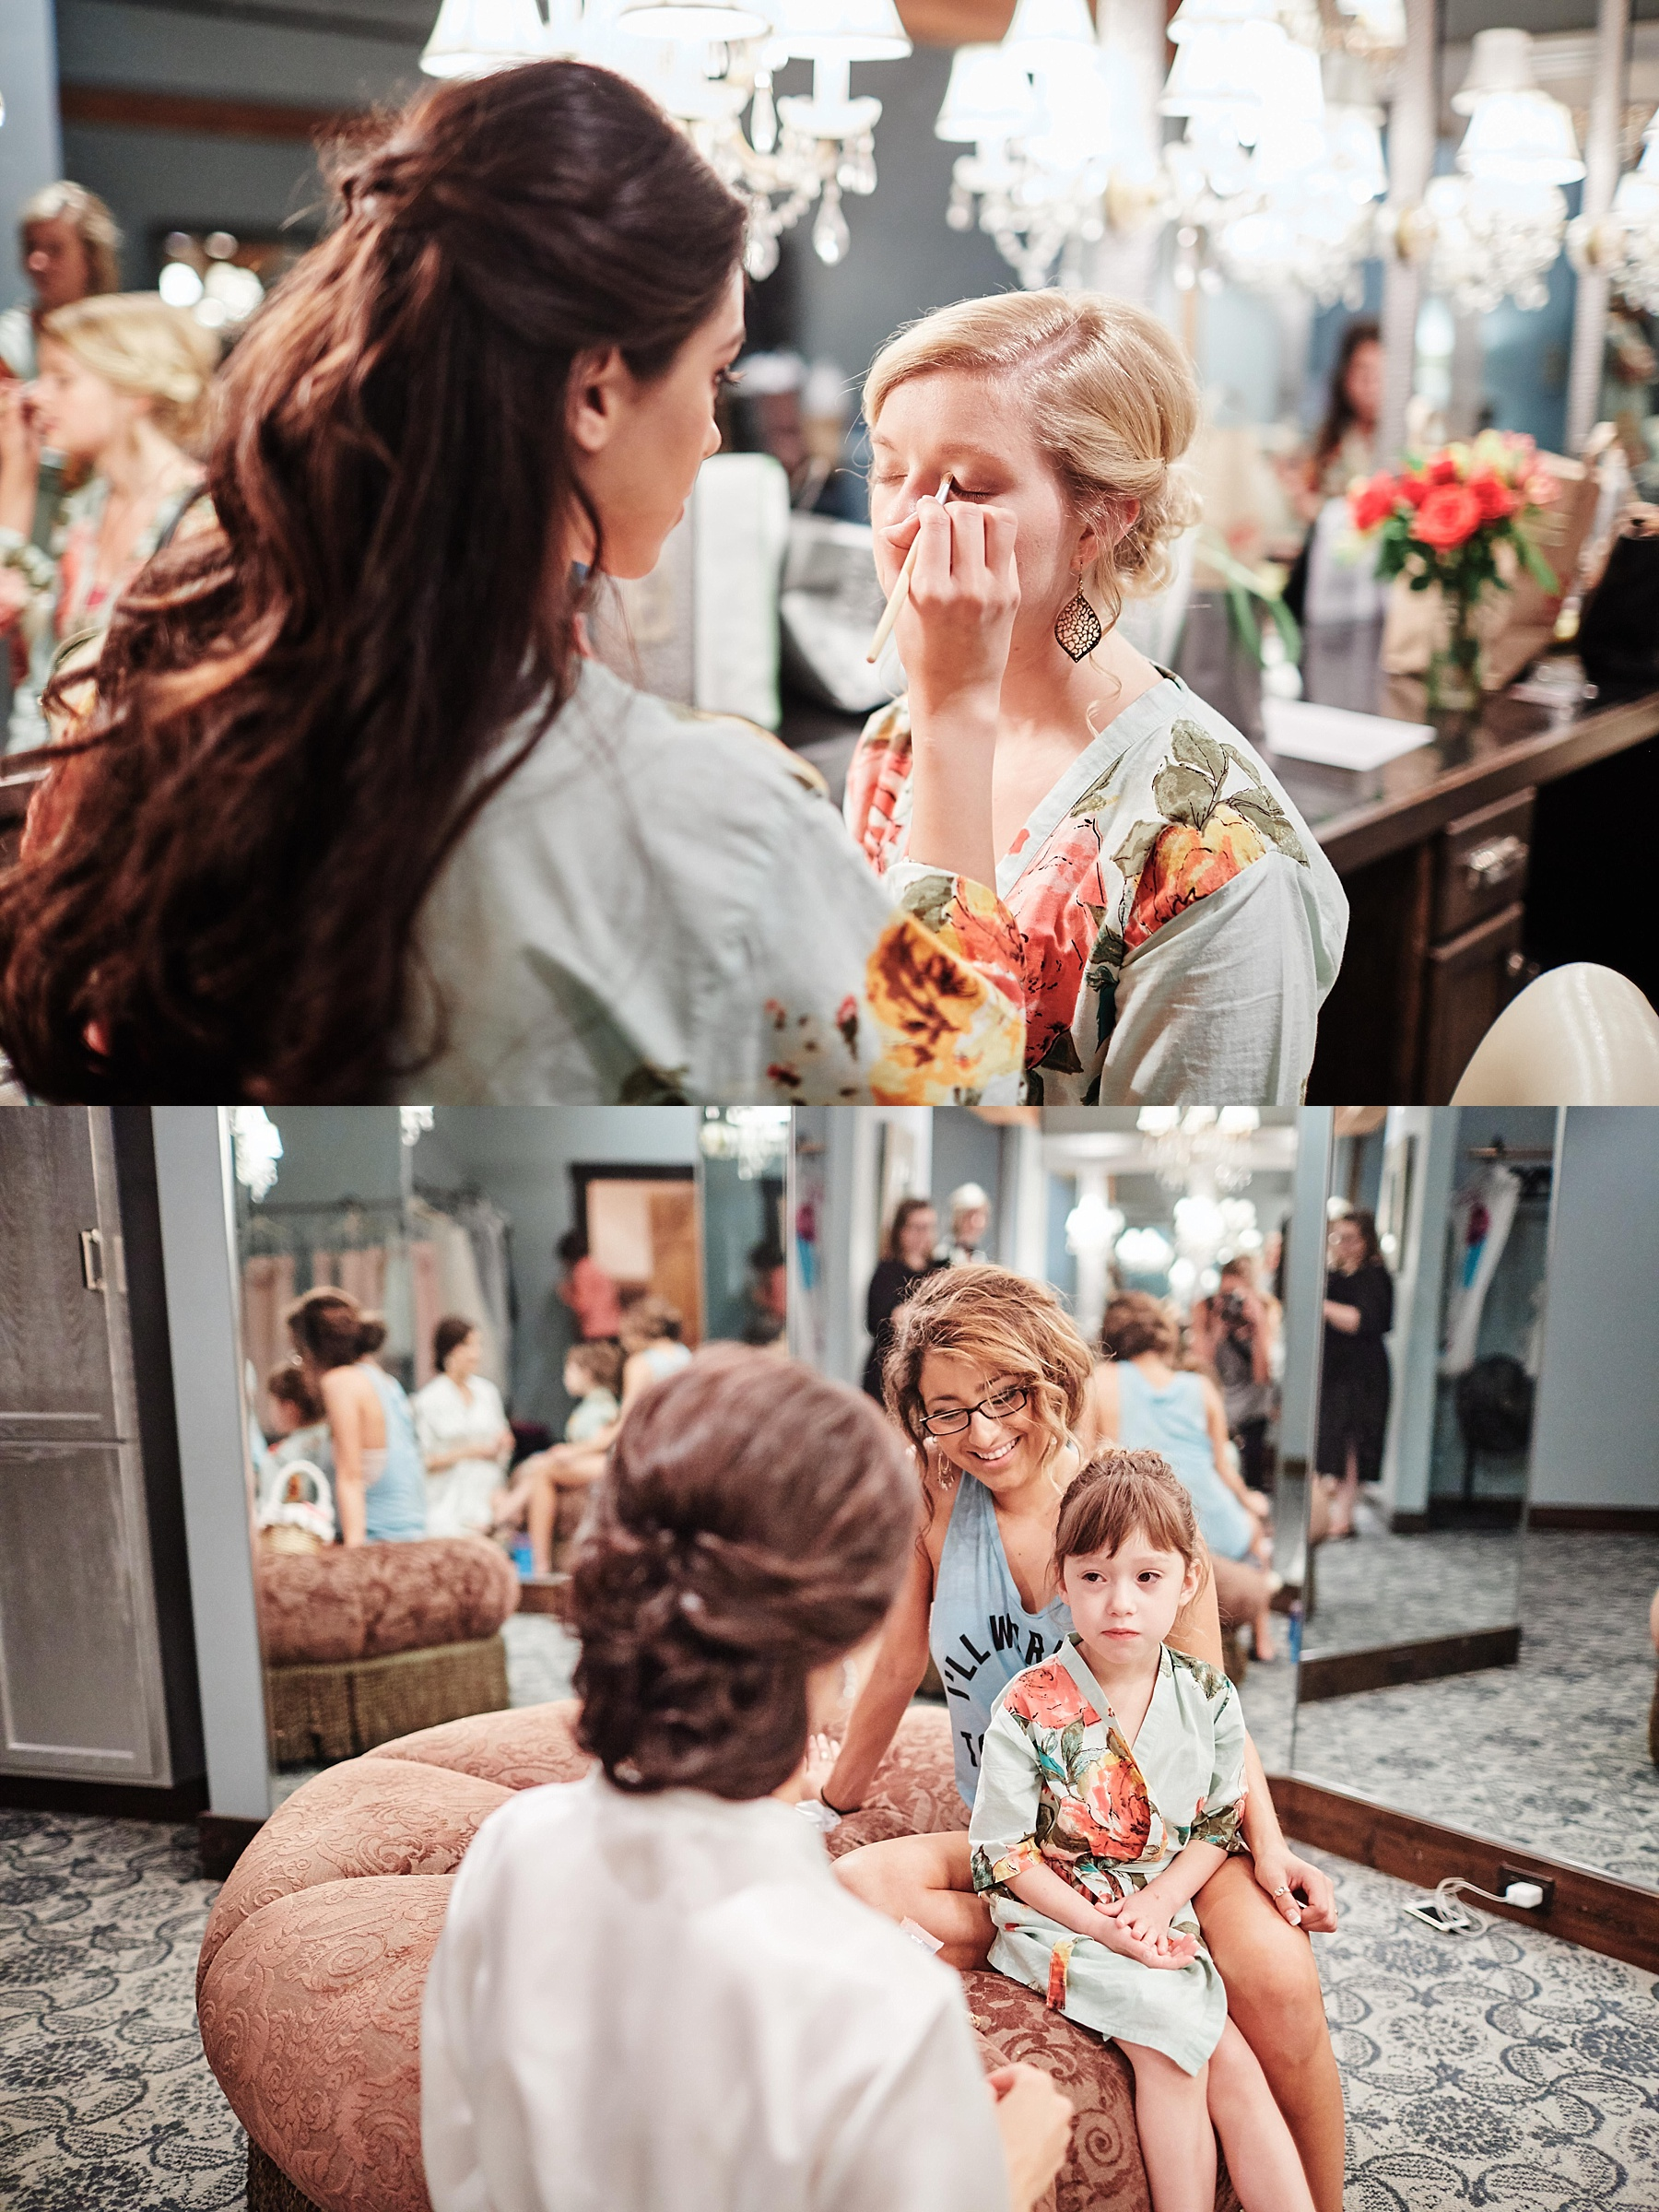 ABULAE-Wedding-Saint-paul-MN-Josh-Sofia-Wedding-Mears-Park_0706.jpg